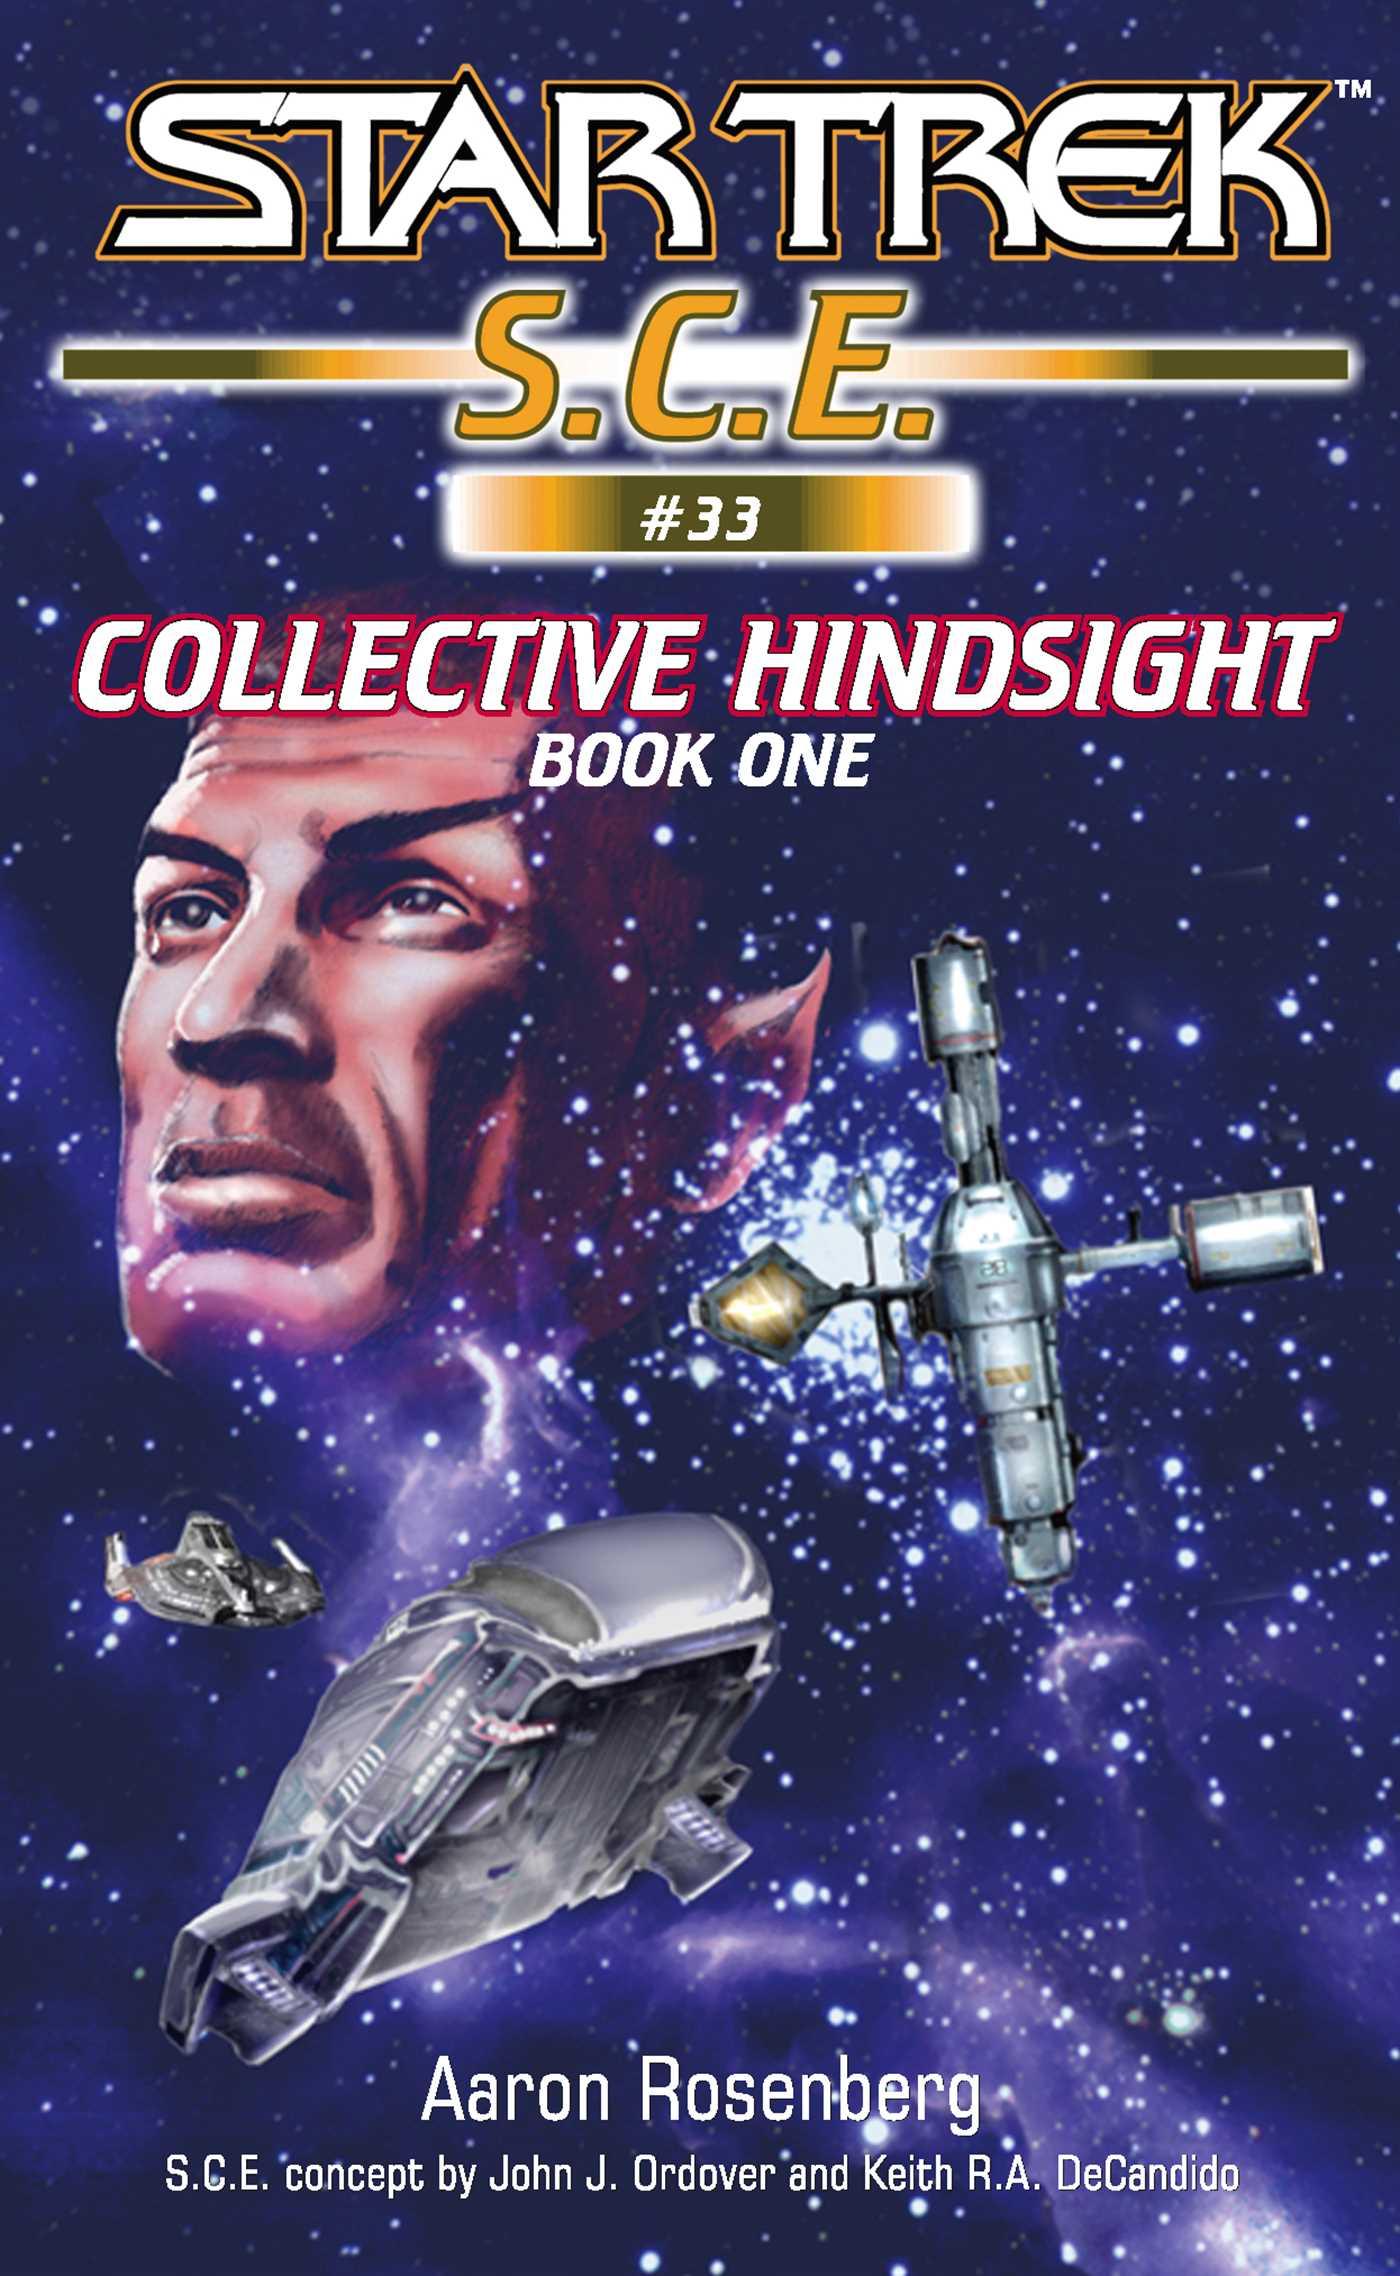 Star trek collective hindsight book 1 9780743480833 hr